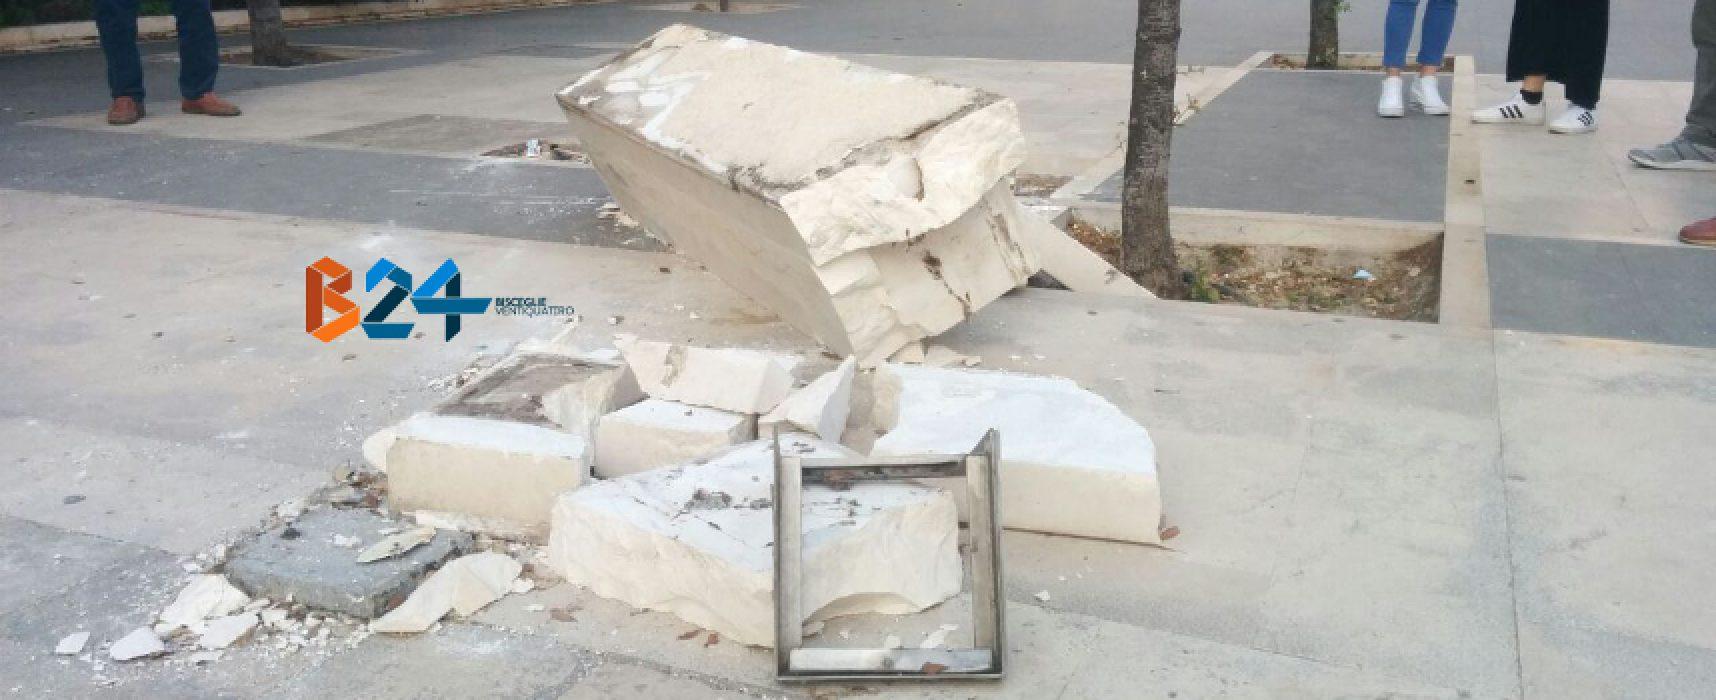 Divelta panchina di pietra in villa, indaga la polizia municipale / FOTO